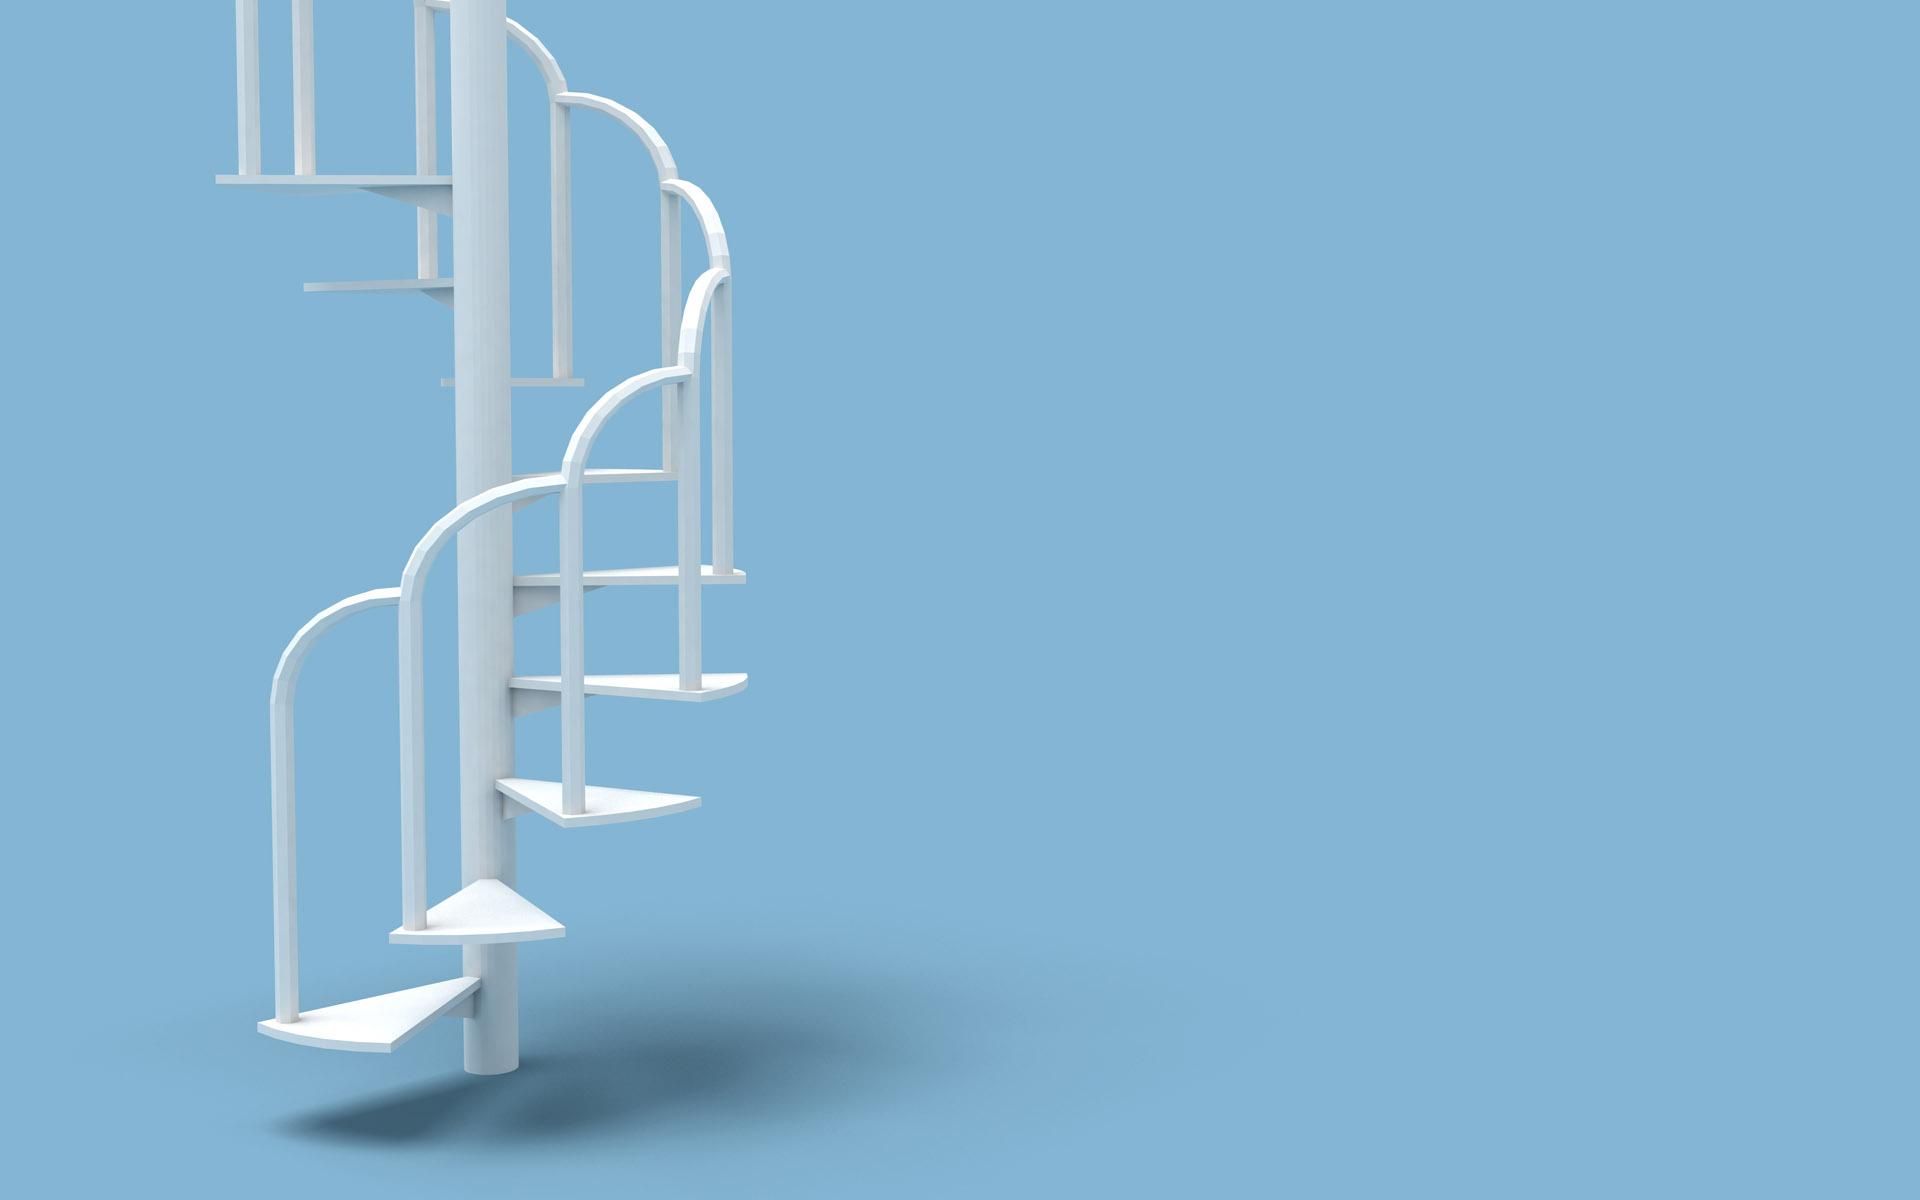 original wallpaper download: White Ladder - 1920x1200